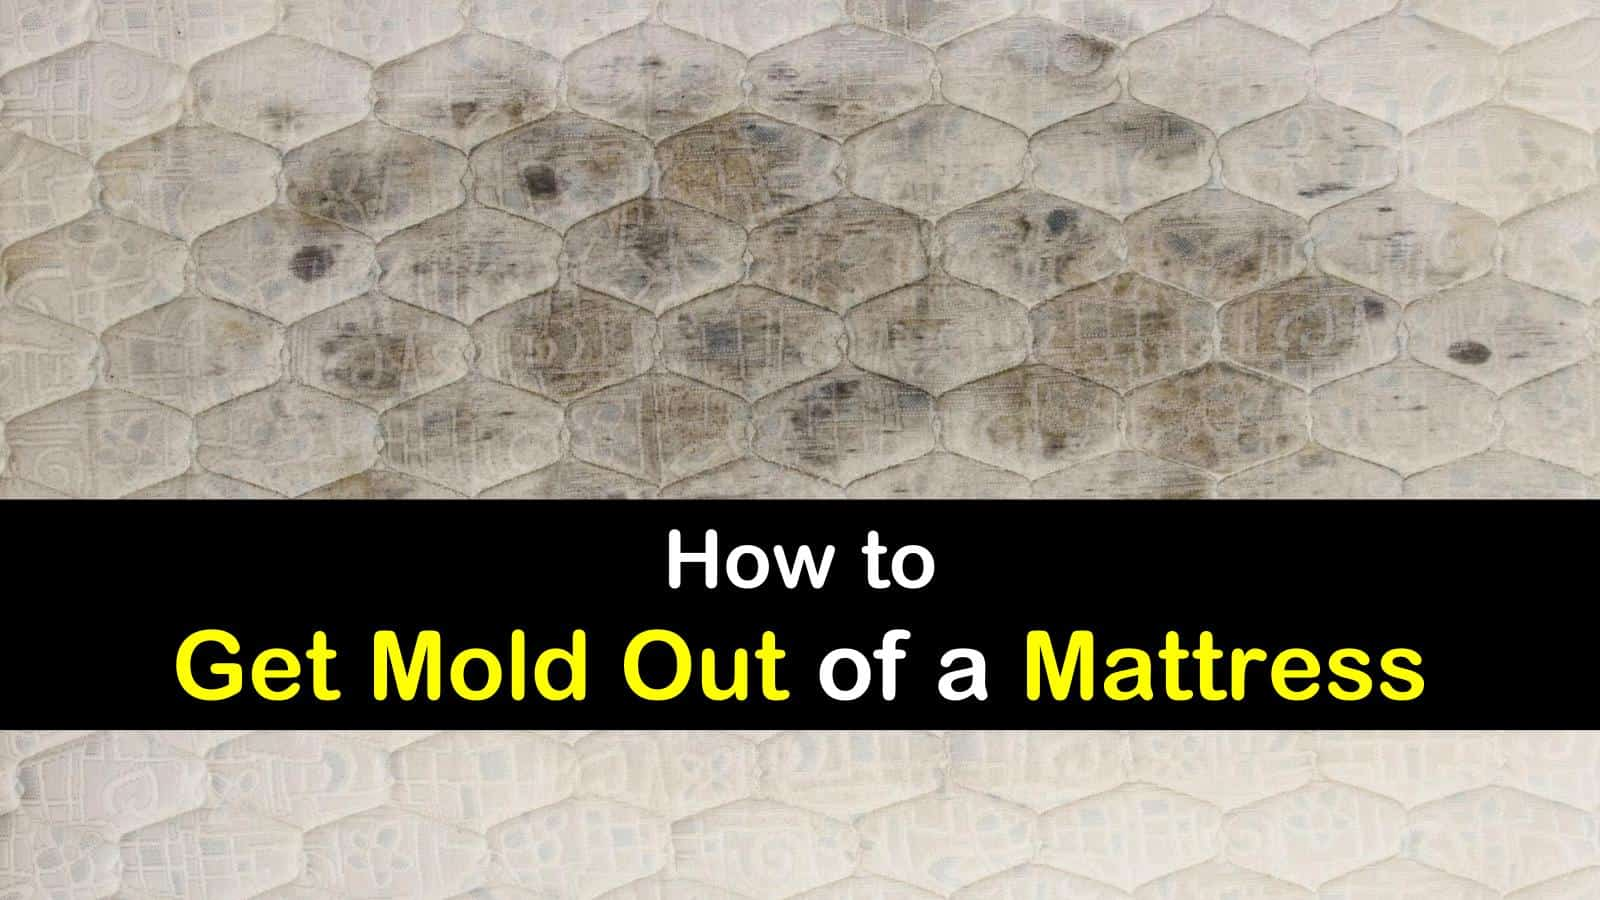 how to get mold out of a mattress titleimg1